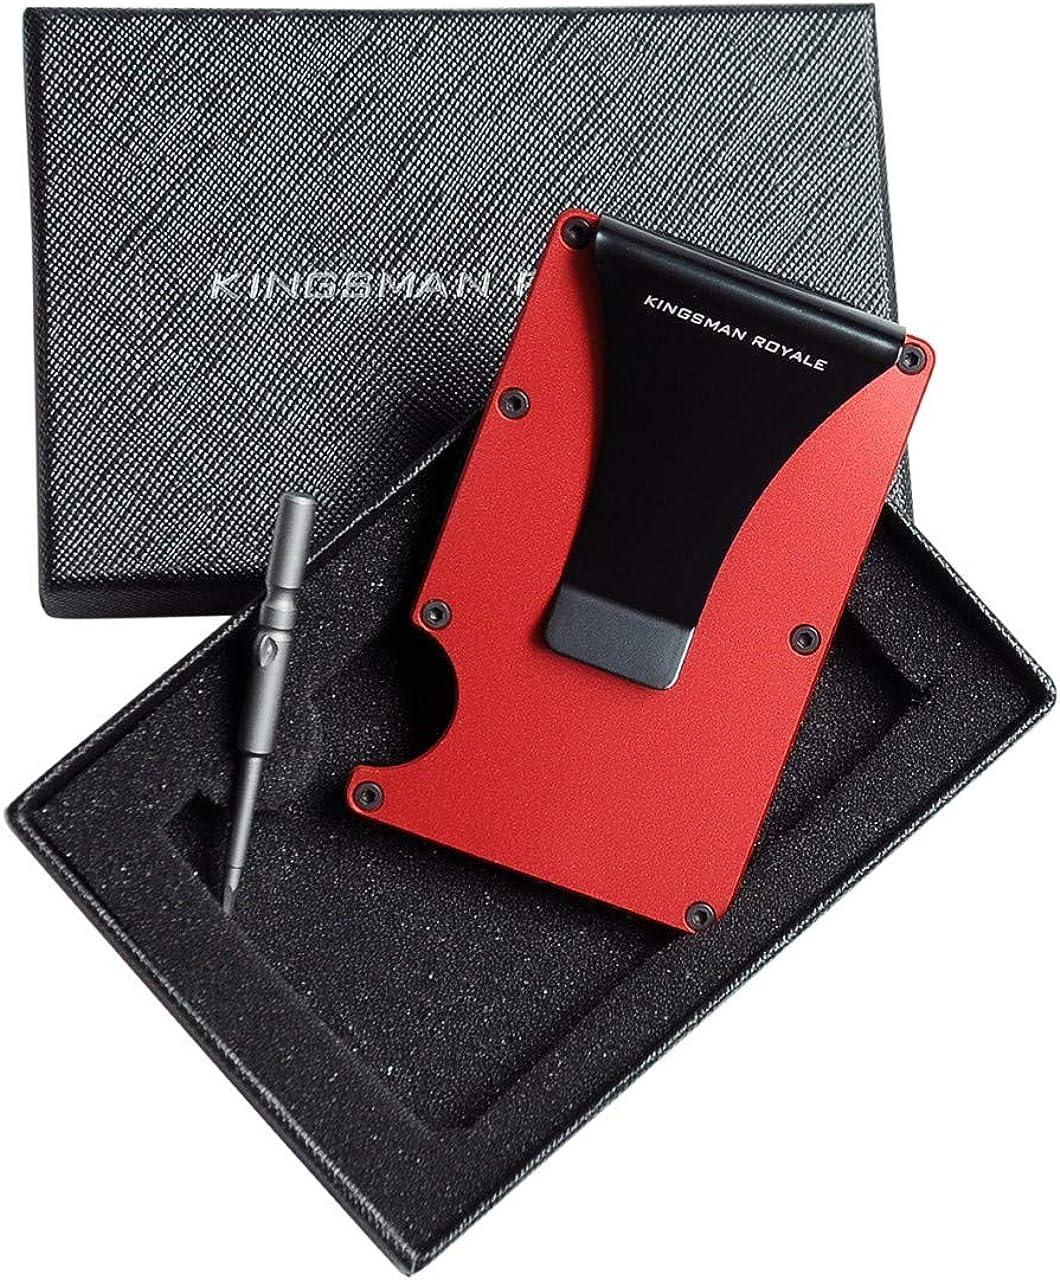 Minimalist Carbon Fiber Aluminum Slim Rfid Front Pocket Wallets with Money Clip by Kingsman Royale